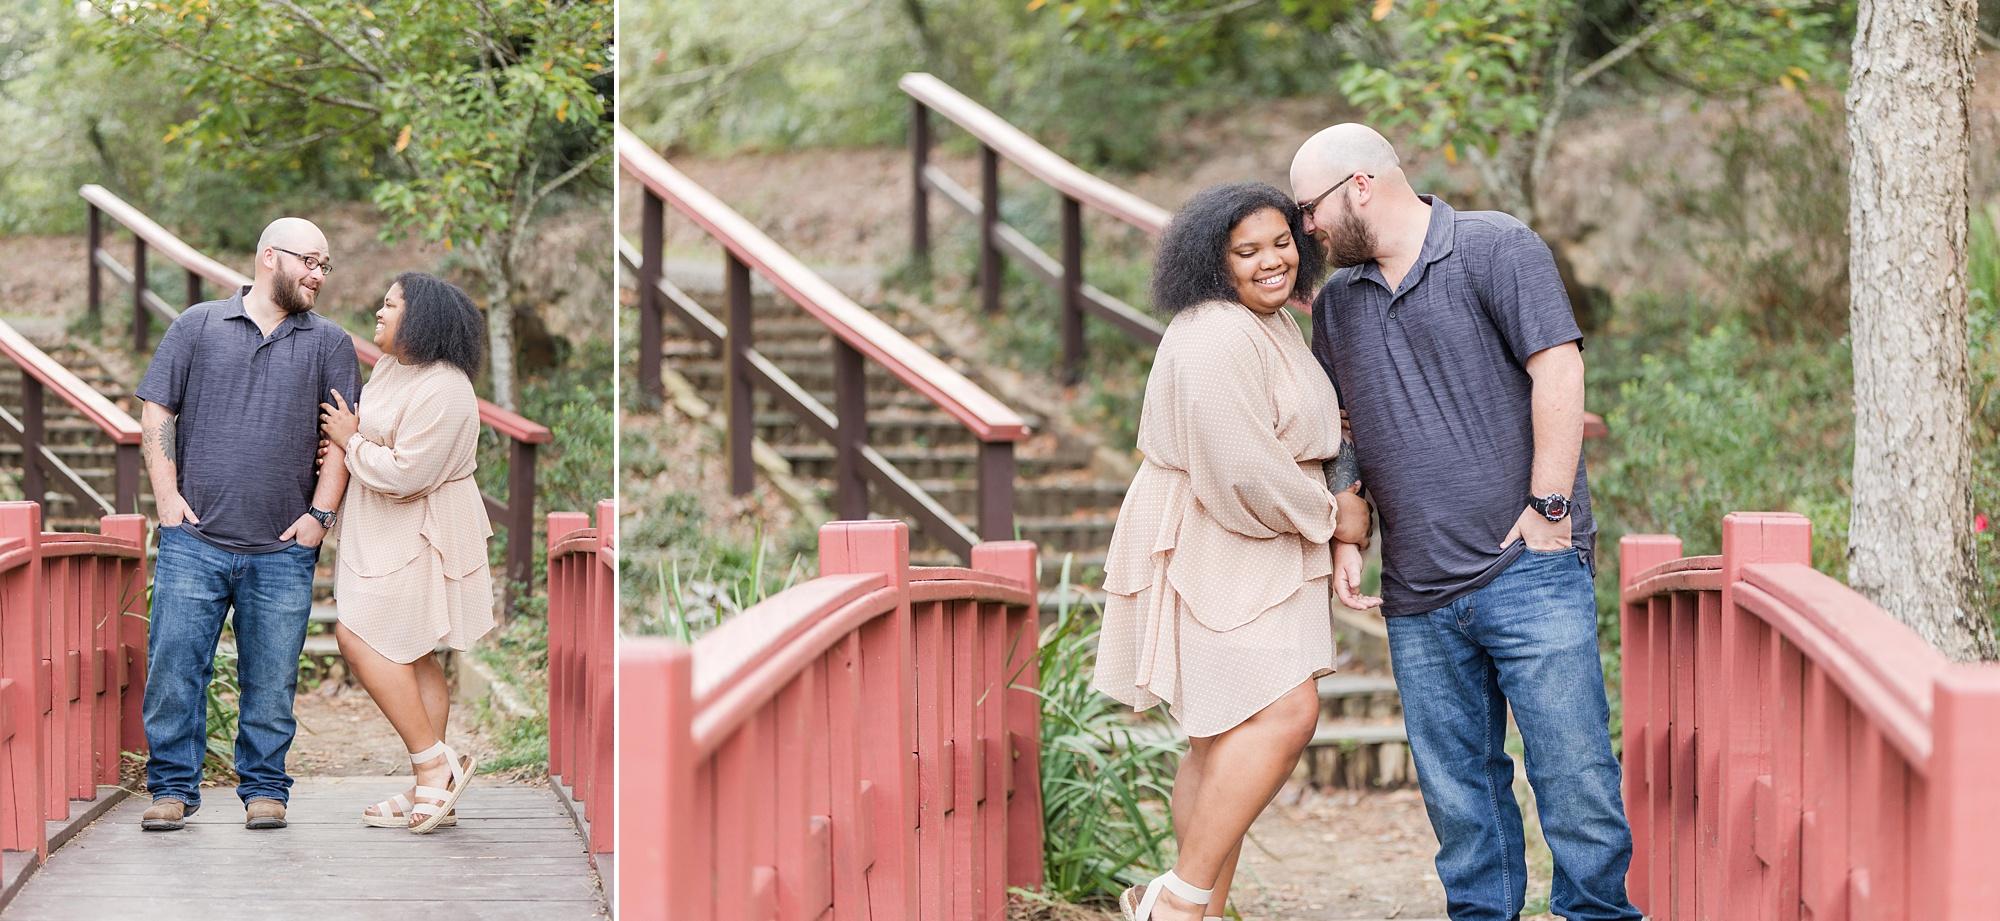 couple poses on walkway in Japanese Garden